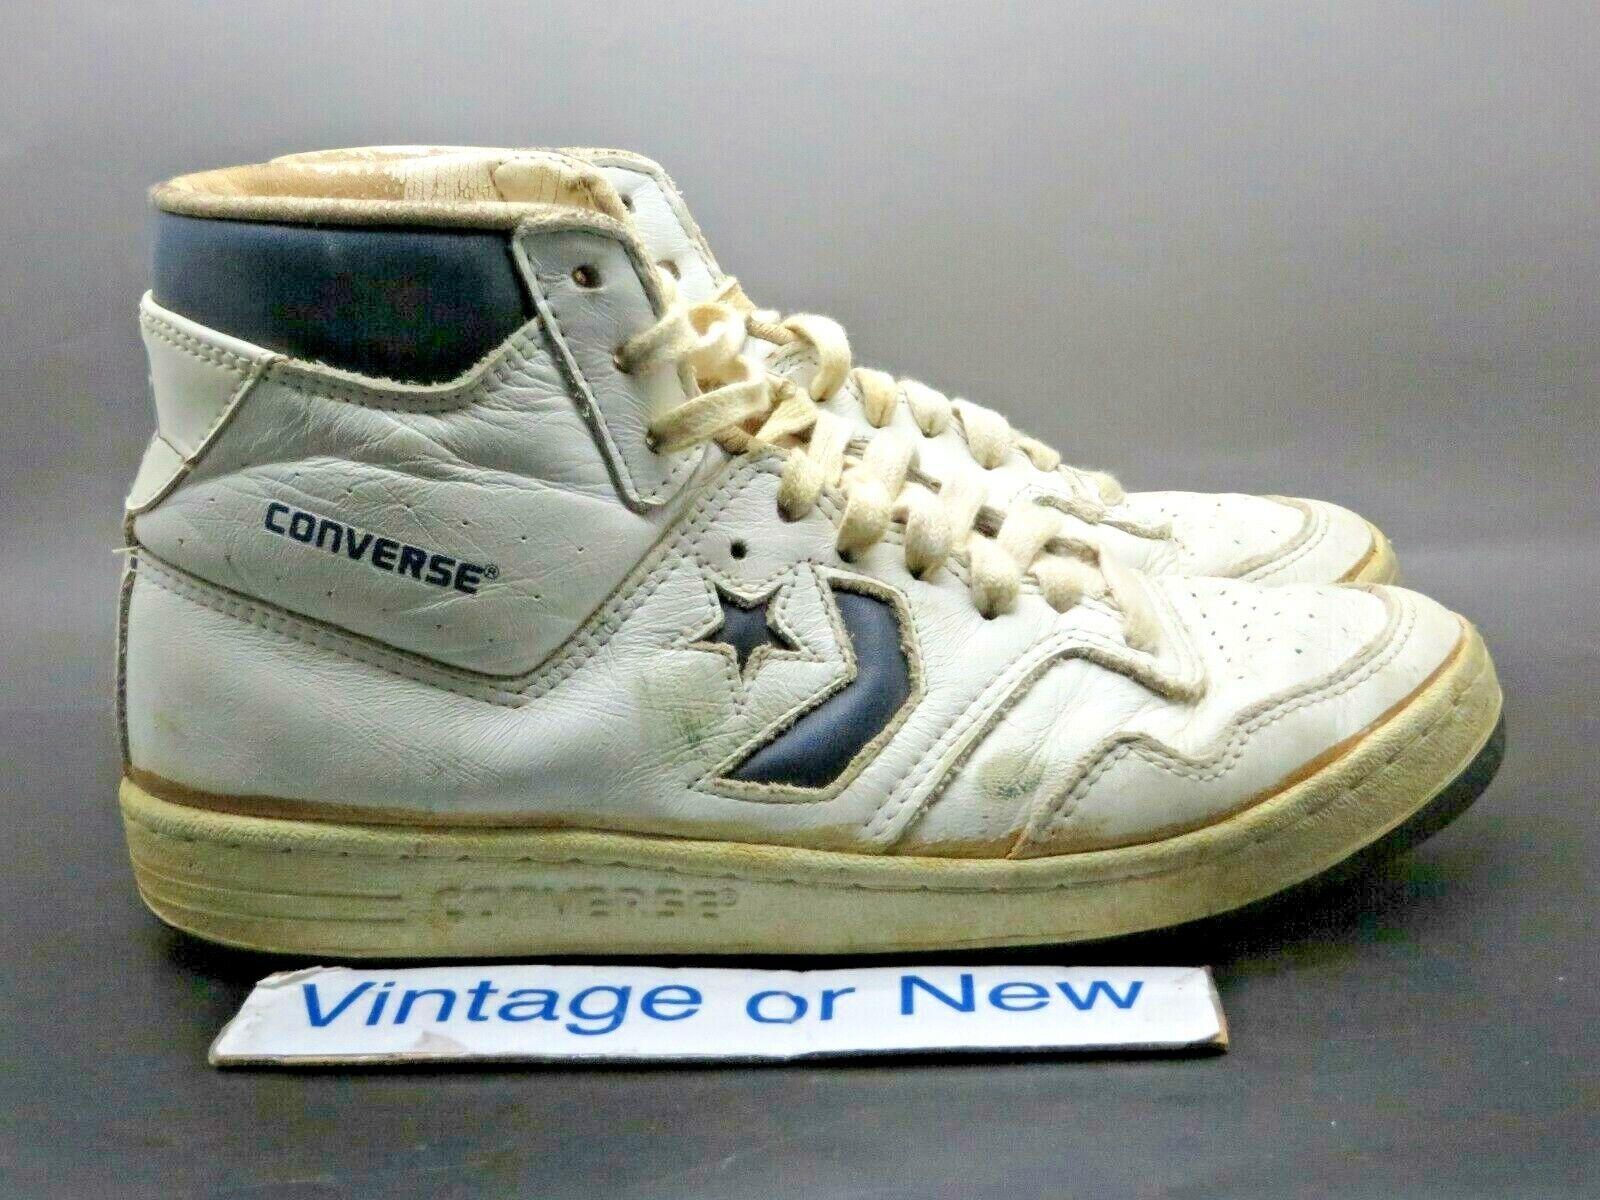 Vintage Années 80 1984 Converse Startech Blanc Bleu Marine Dr. J Basketball chaussures sz 7